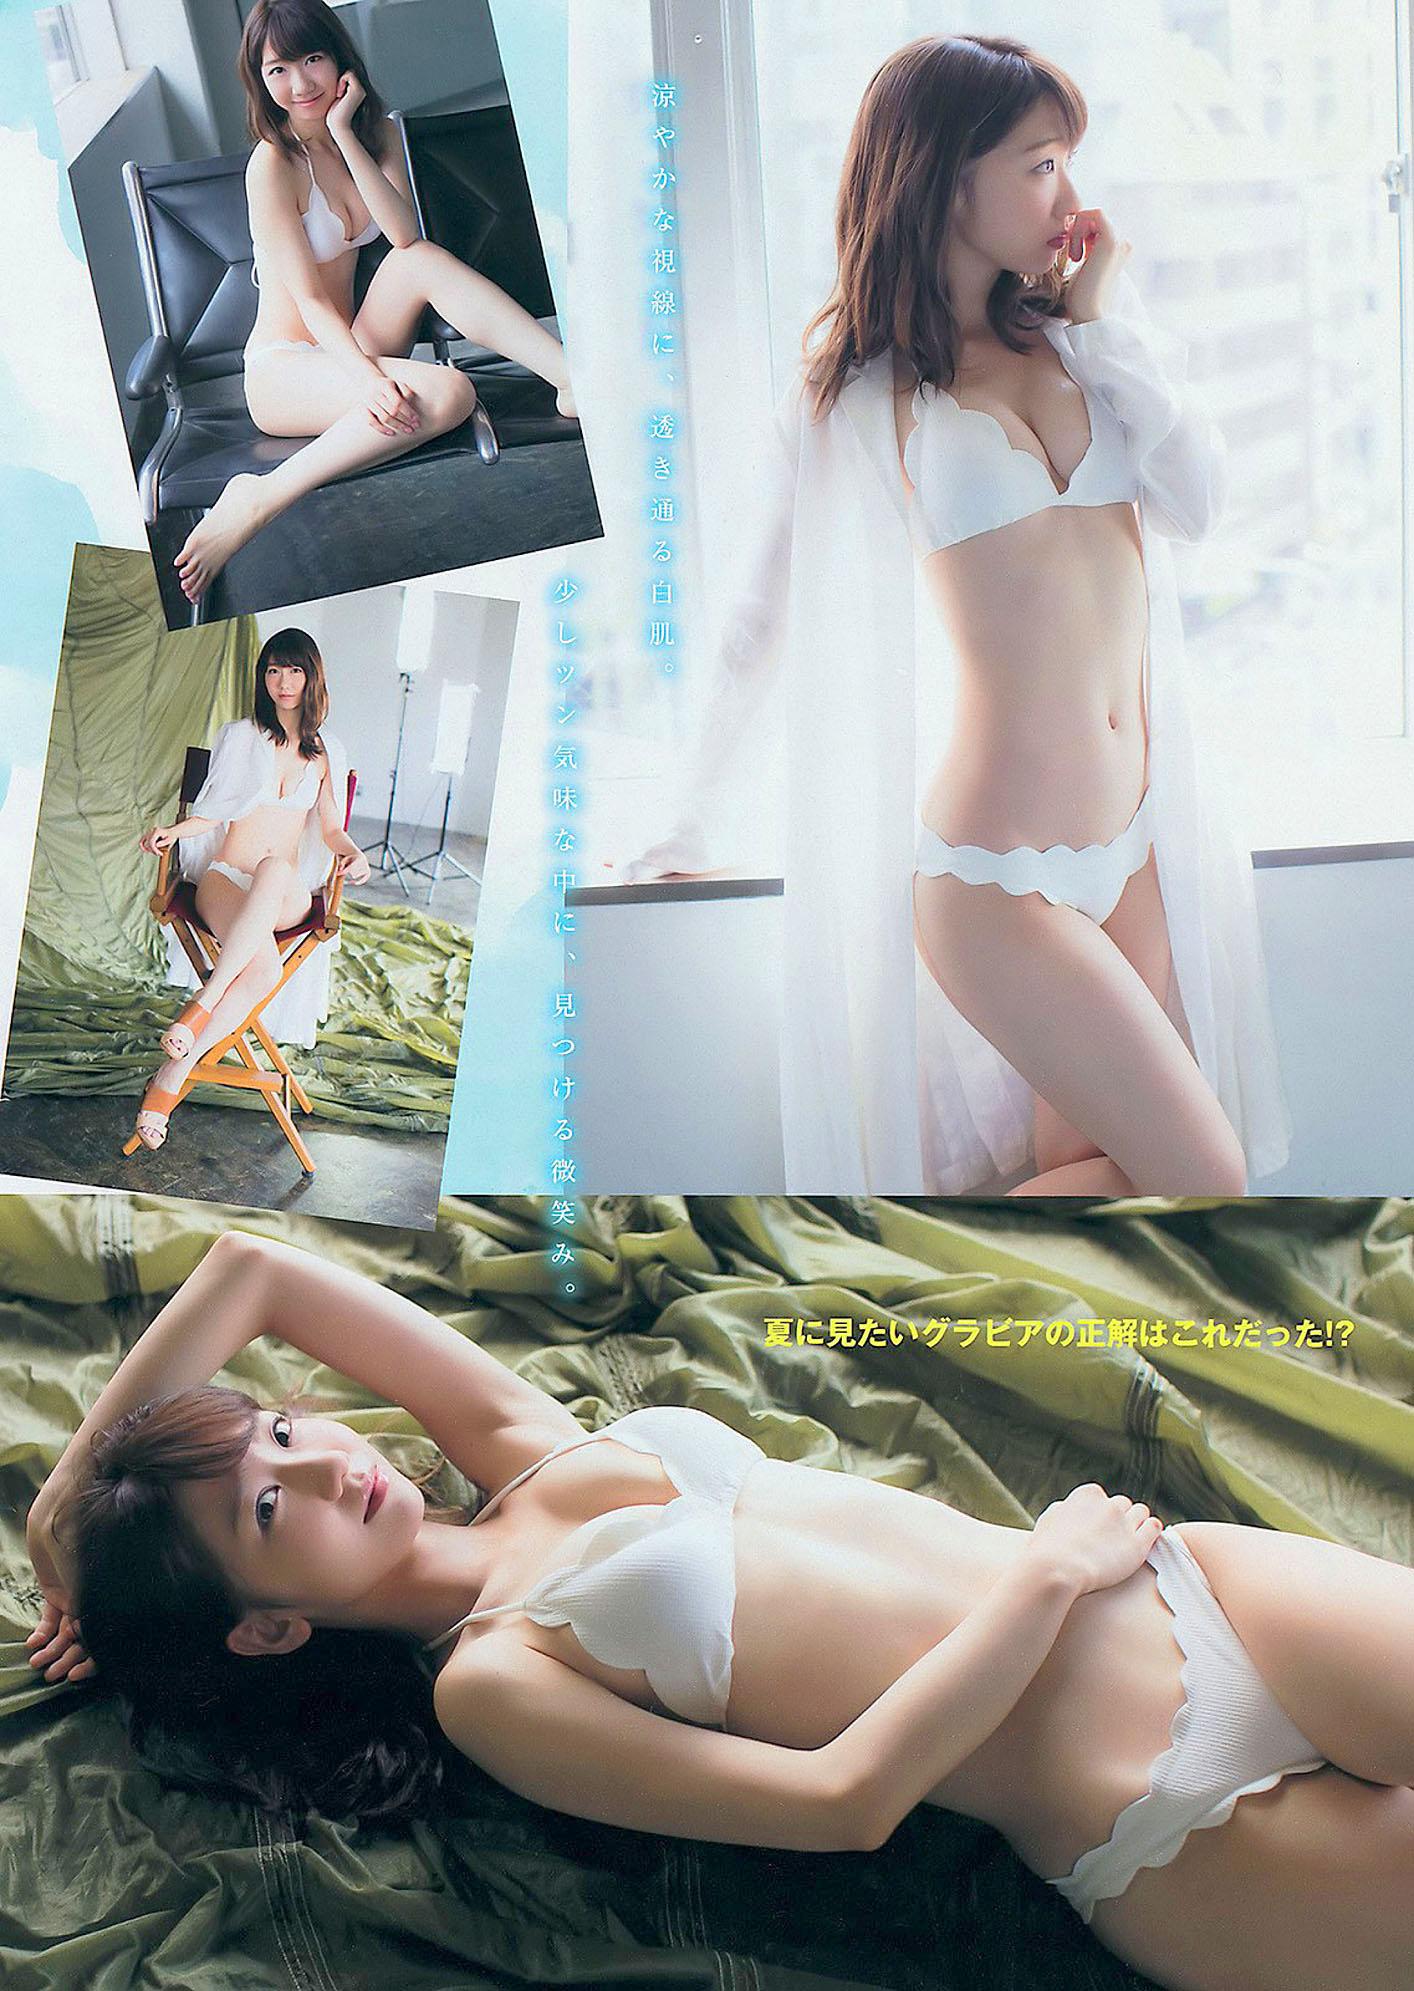 YKashiwagi Young Magazine 160822 03.jpg